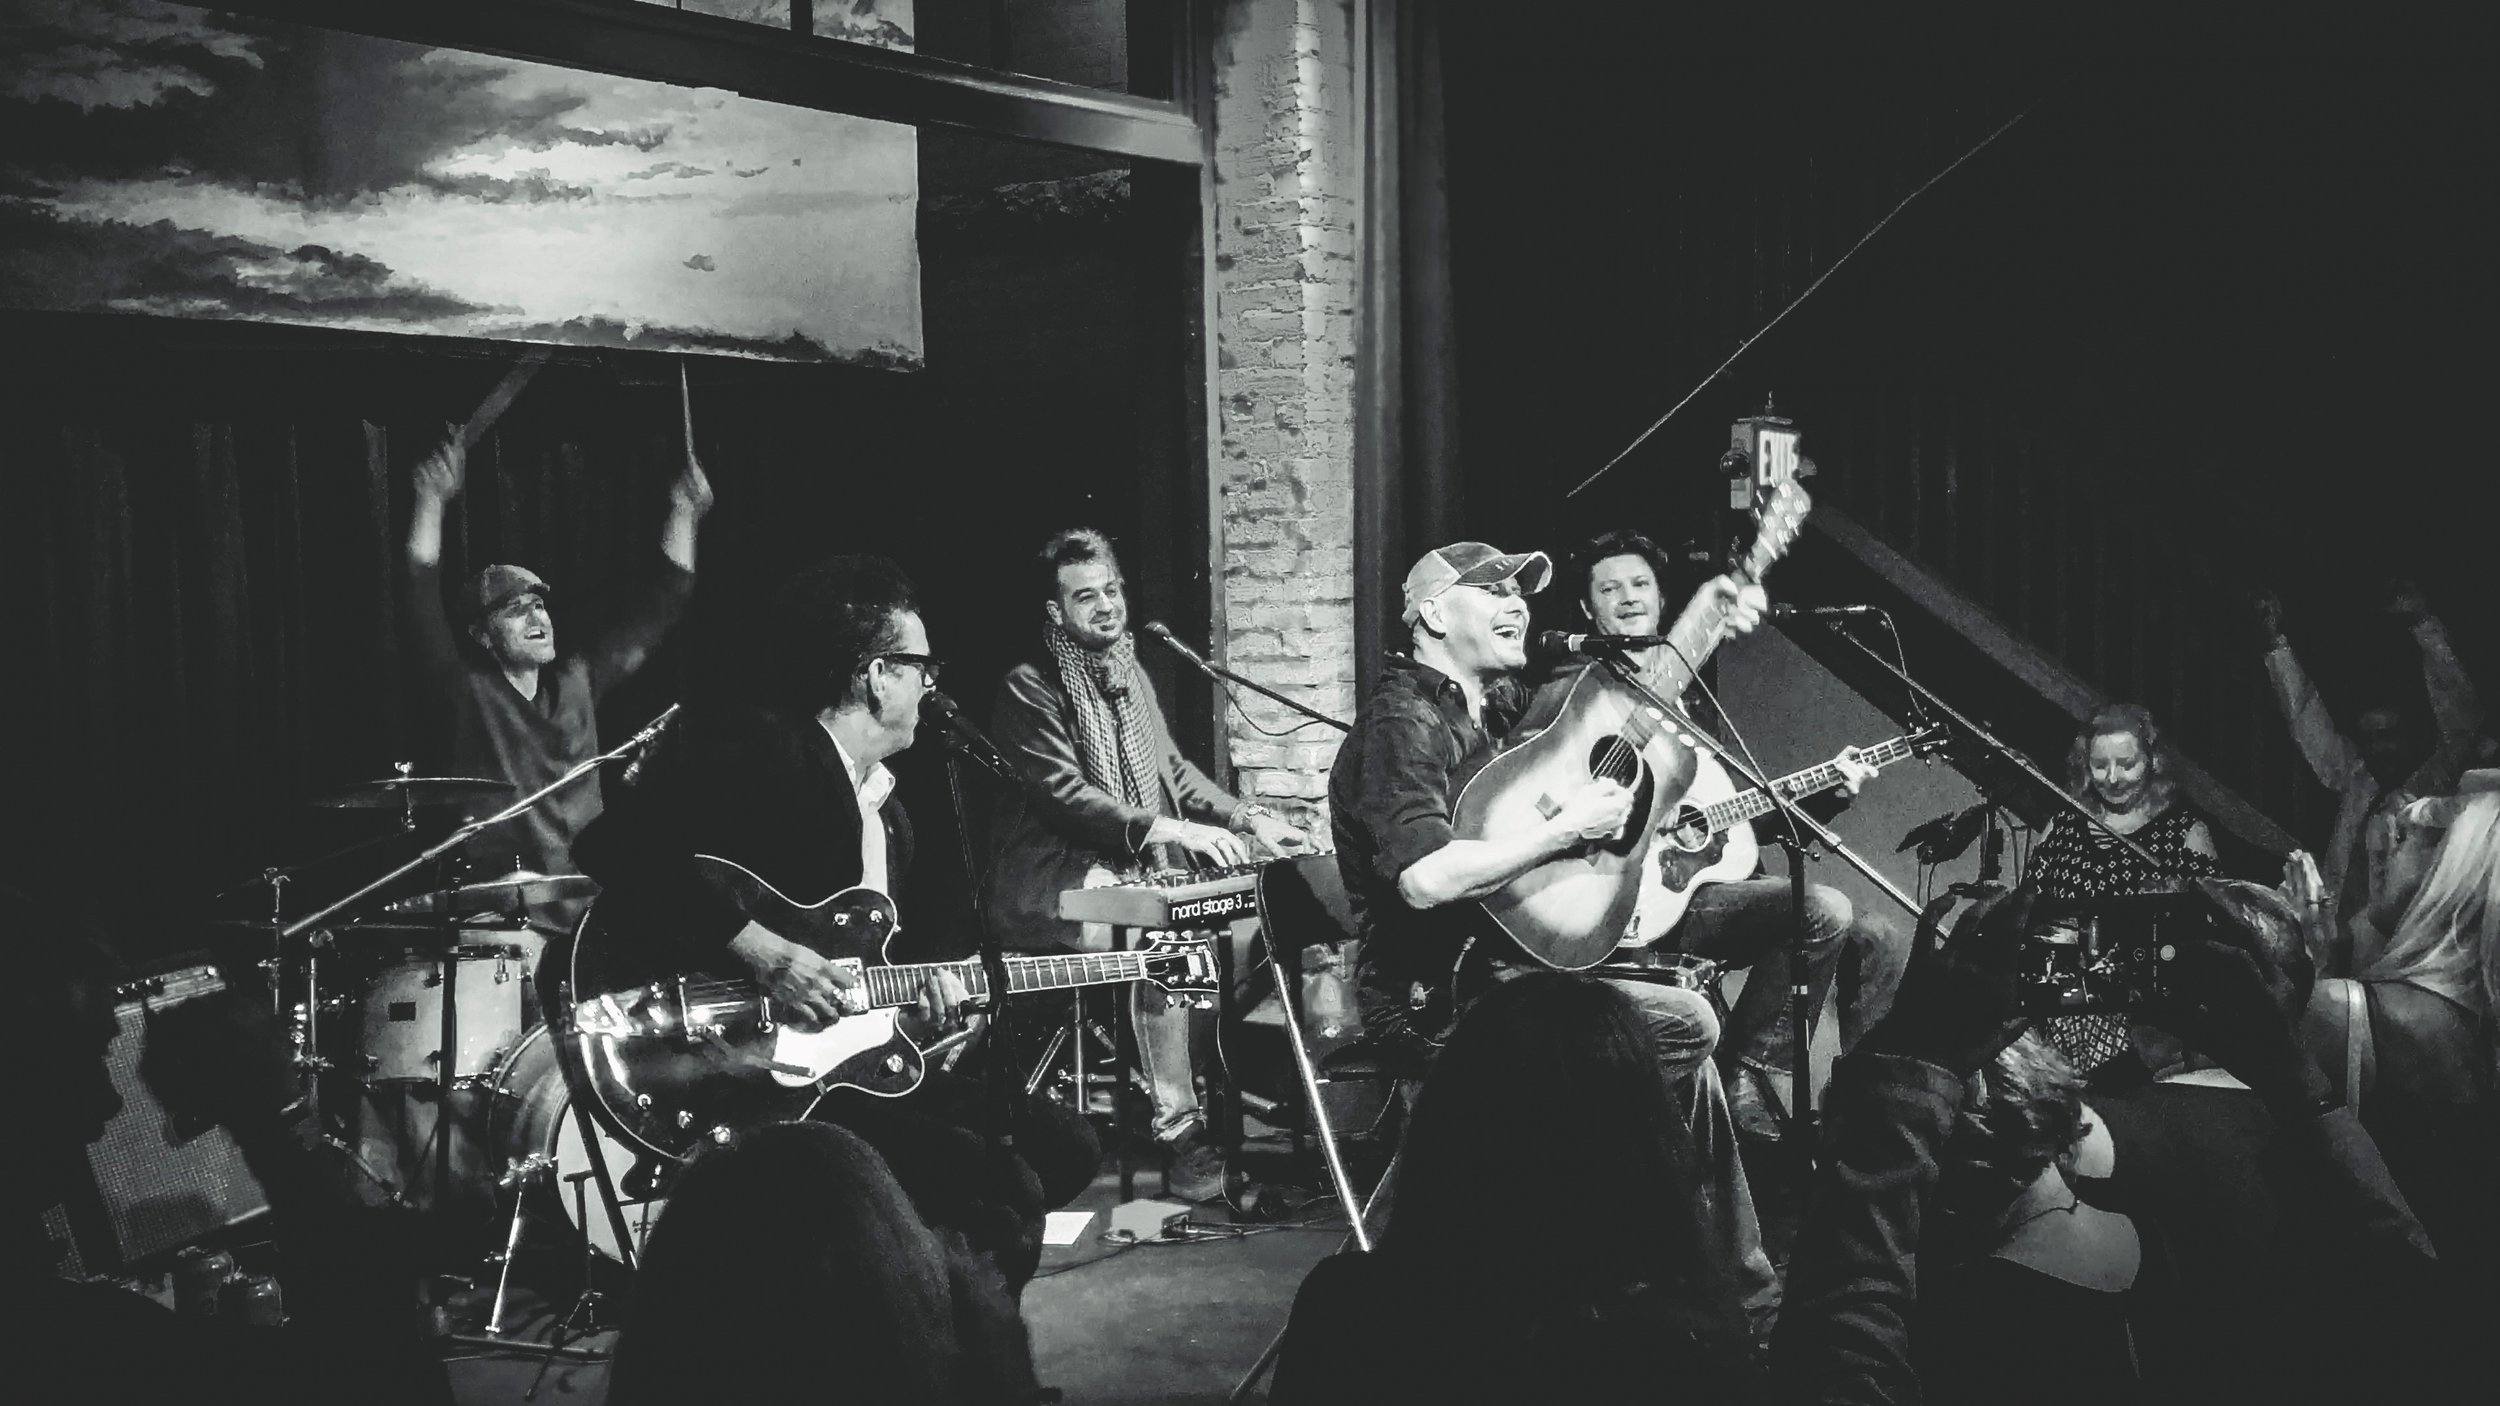 GB_Leighton_Band_Acoustic_B&W.jpg